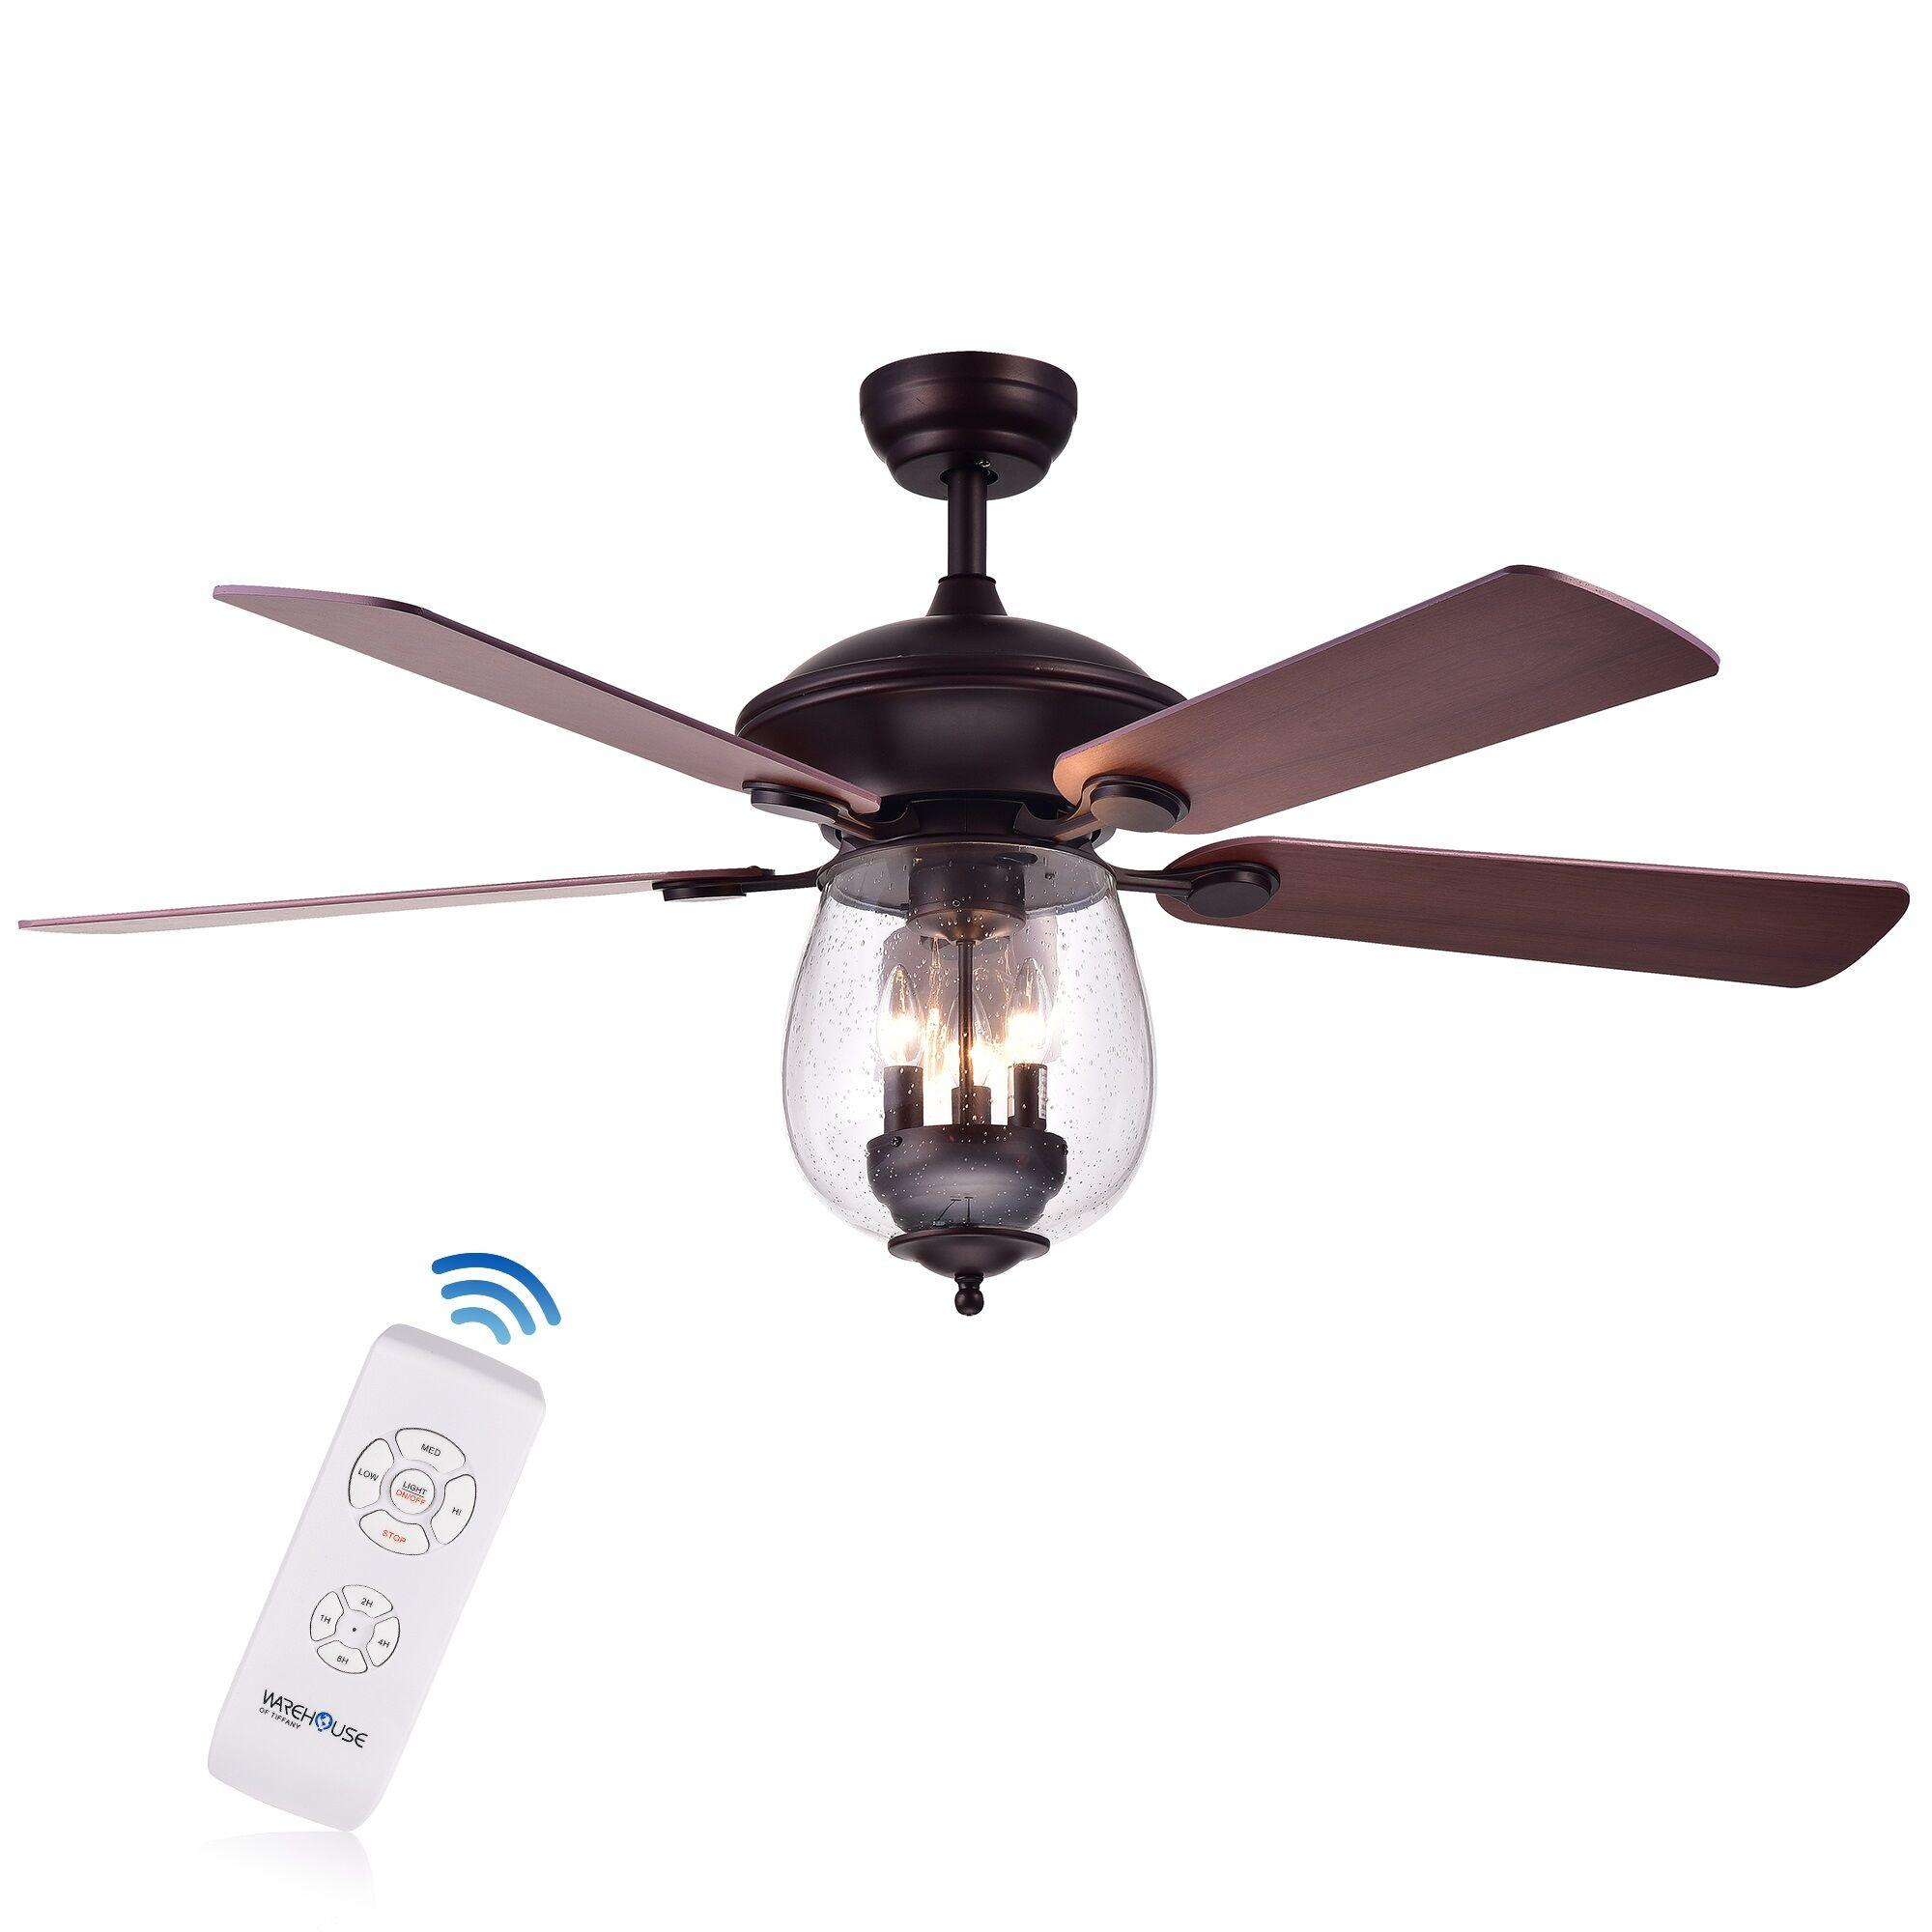 Rueben 5 Blade Ceiling Fan Accessories: Remotes